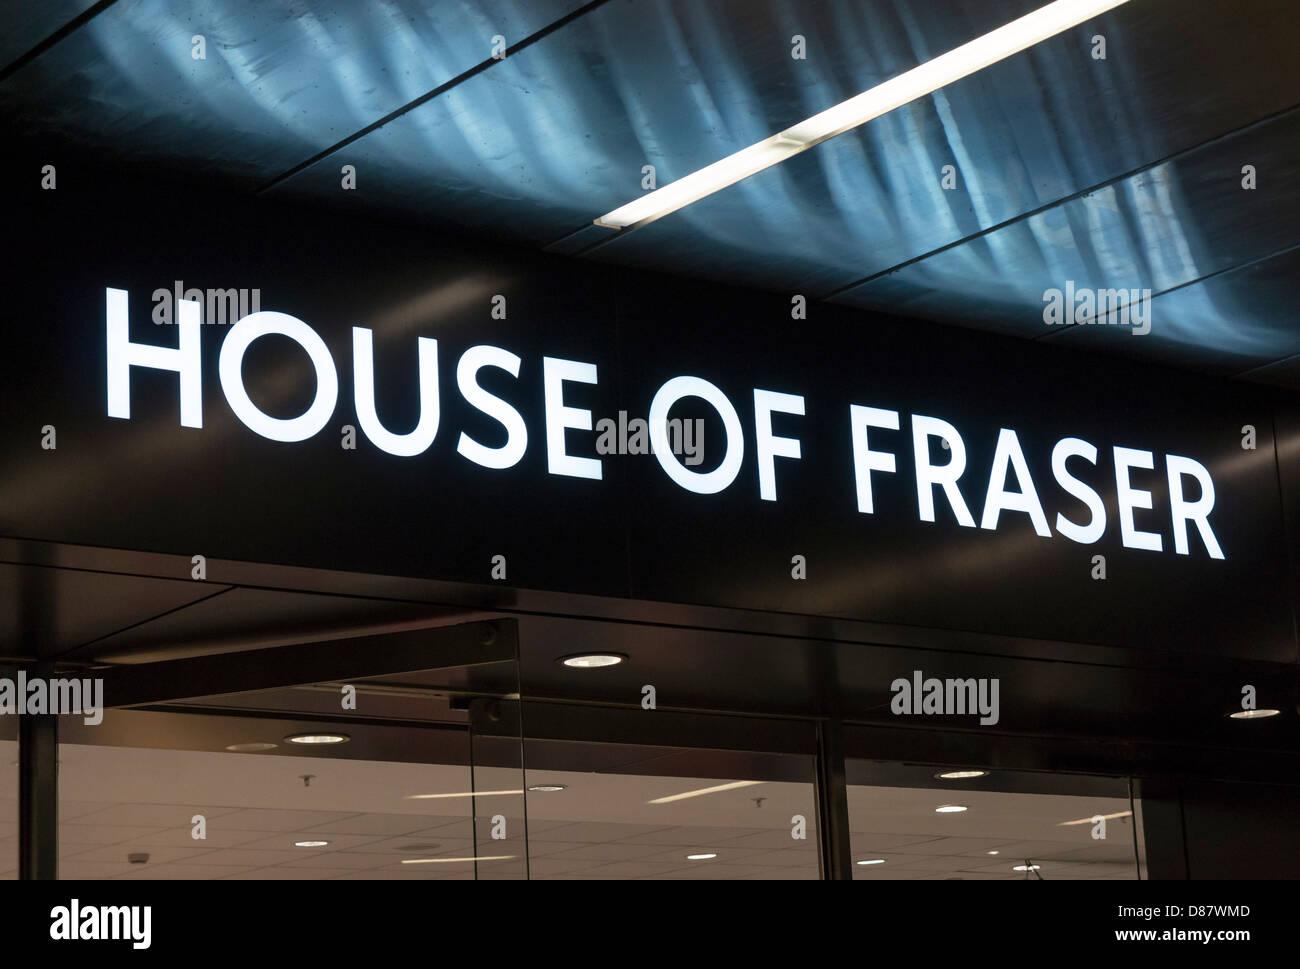 House of Fraser department store logo, UK - Stock Image